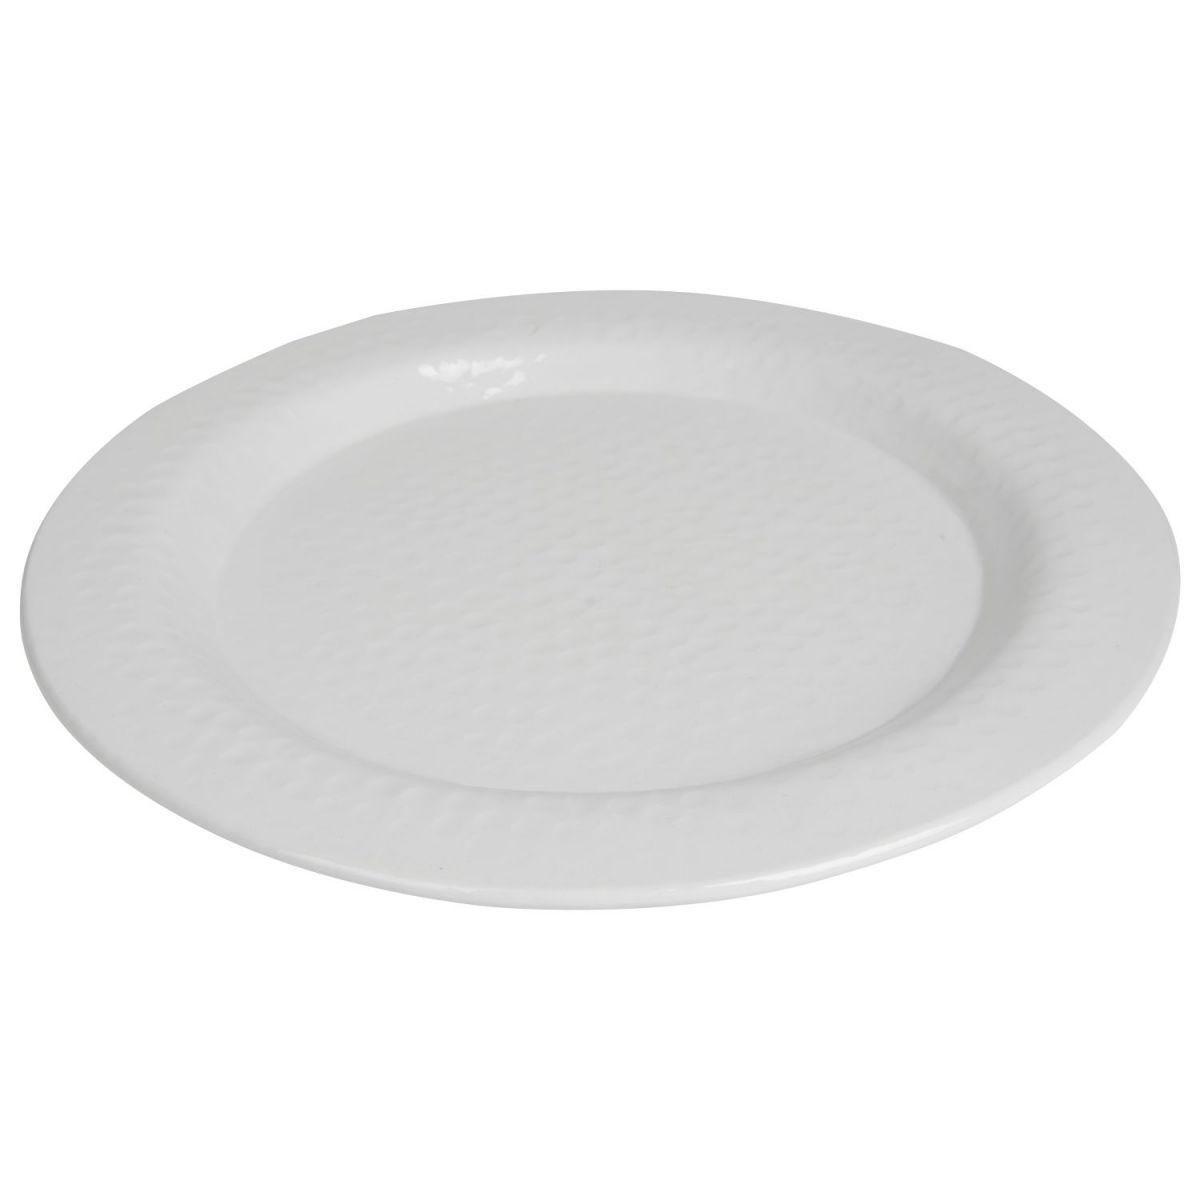 plate hammered white 30cm